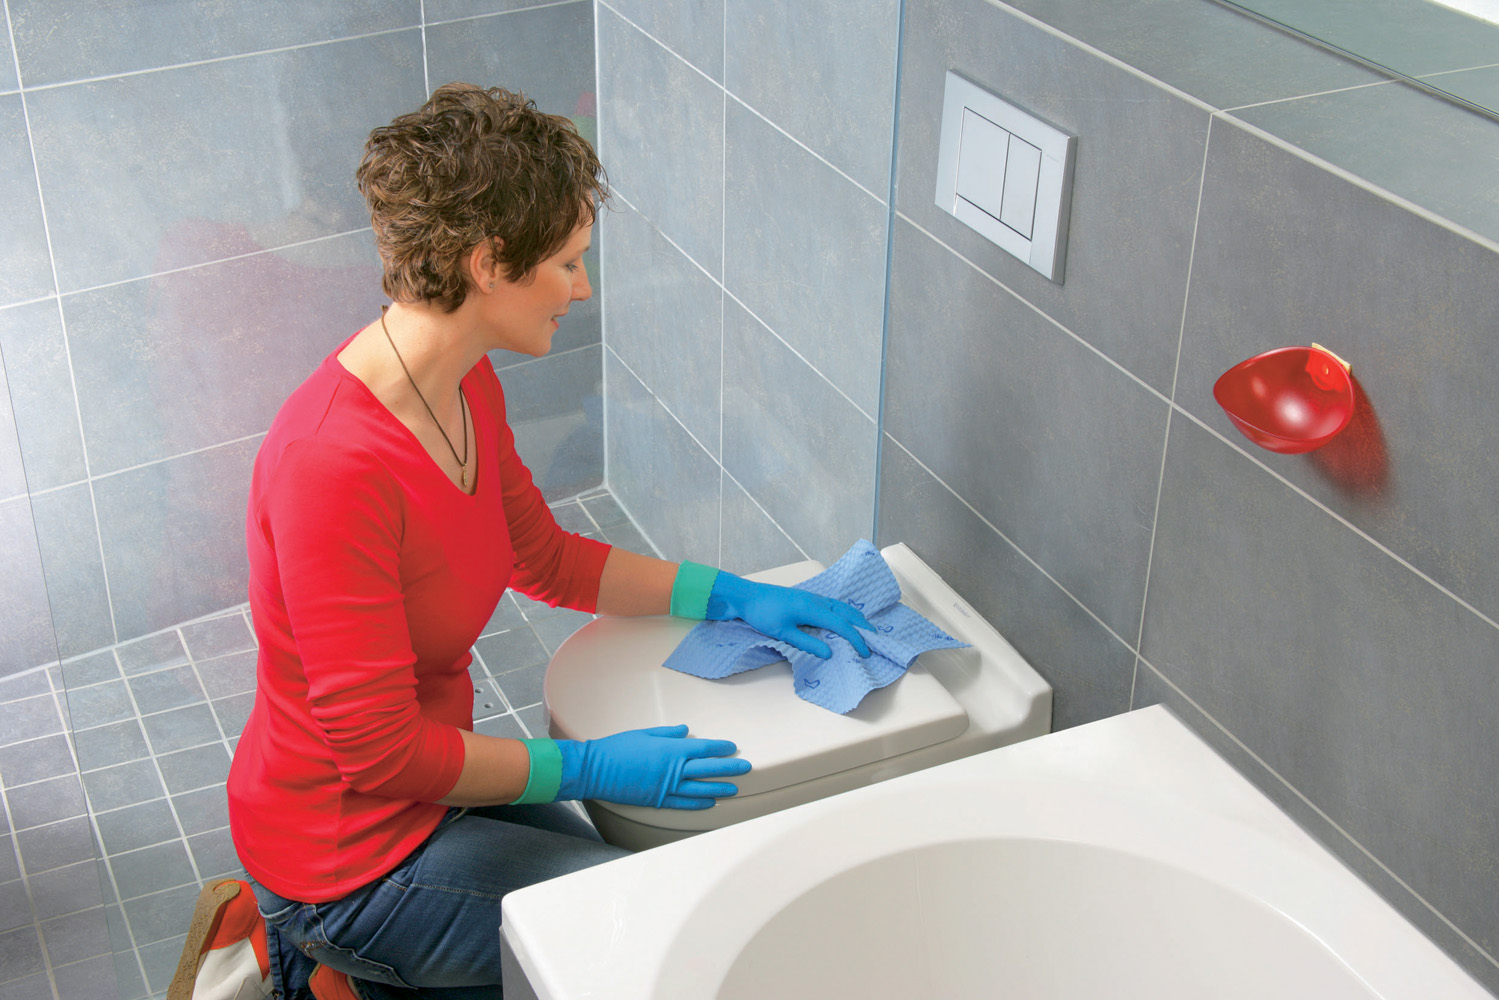 Bathroom Design Easy To Clean easy to clean bathroom design tips – blitz gal